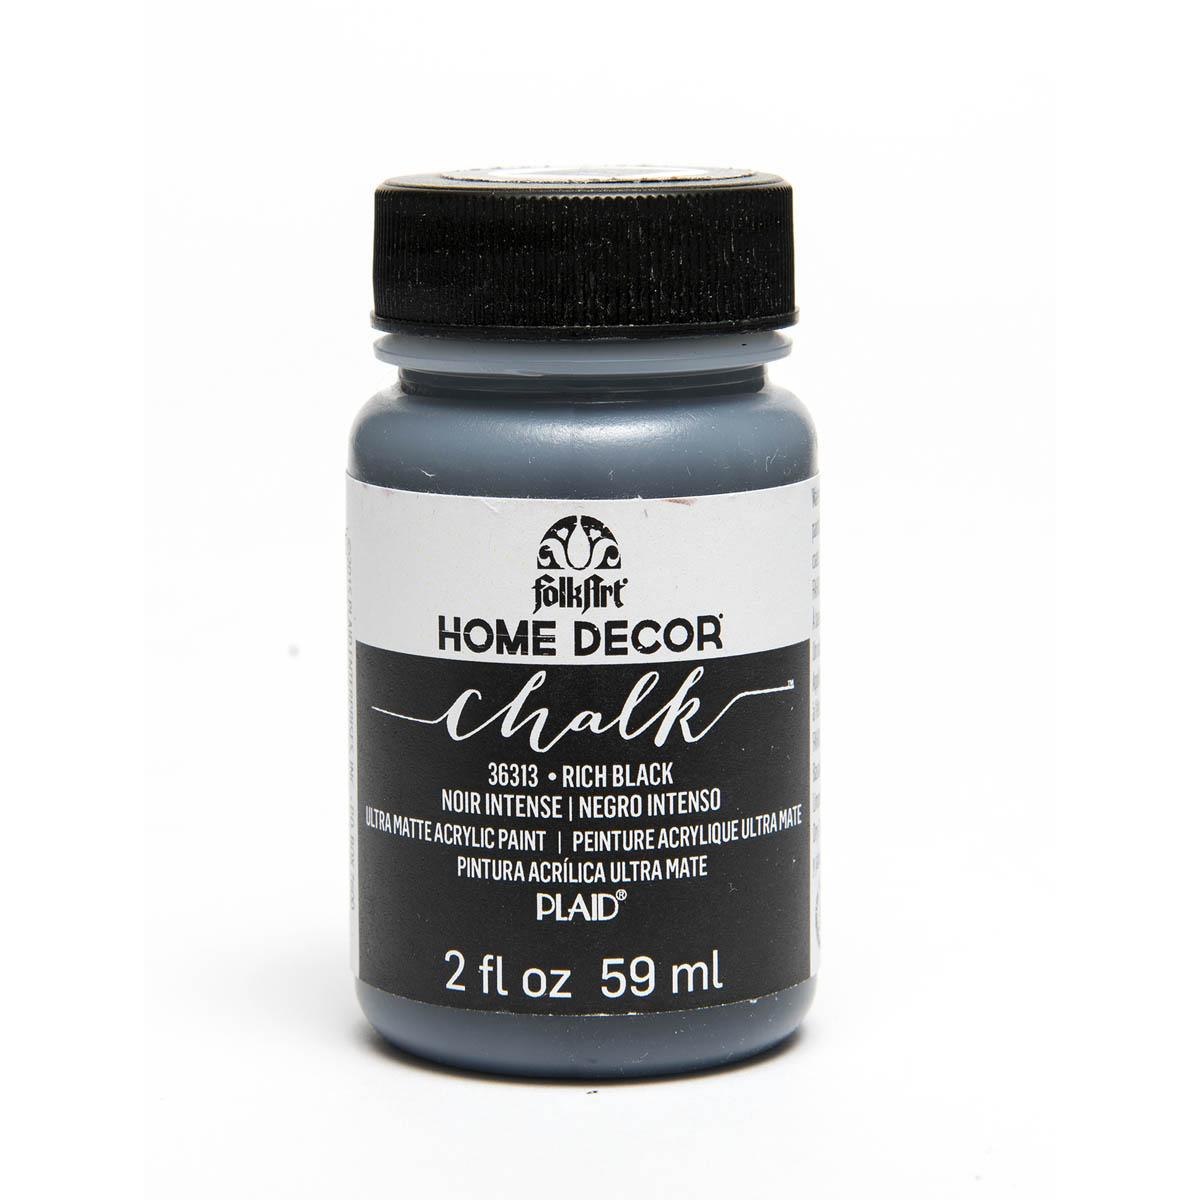 FolkArt ® Home Decor™ Chalk - Rich Black, 2 oz. - 36313